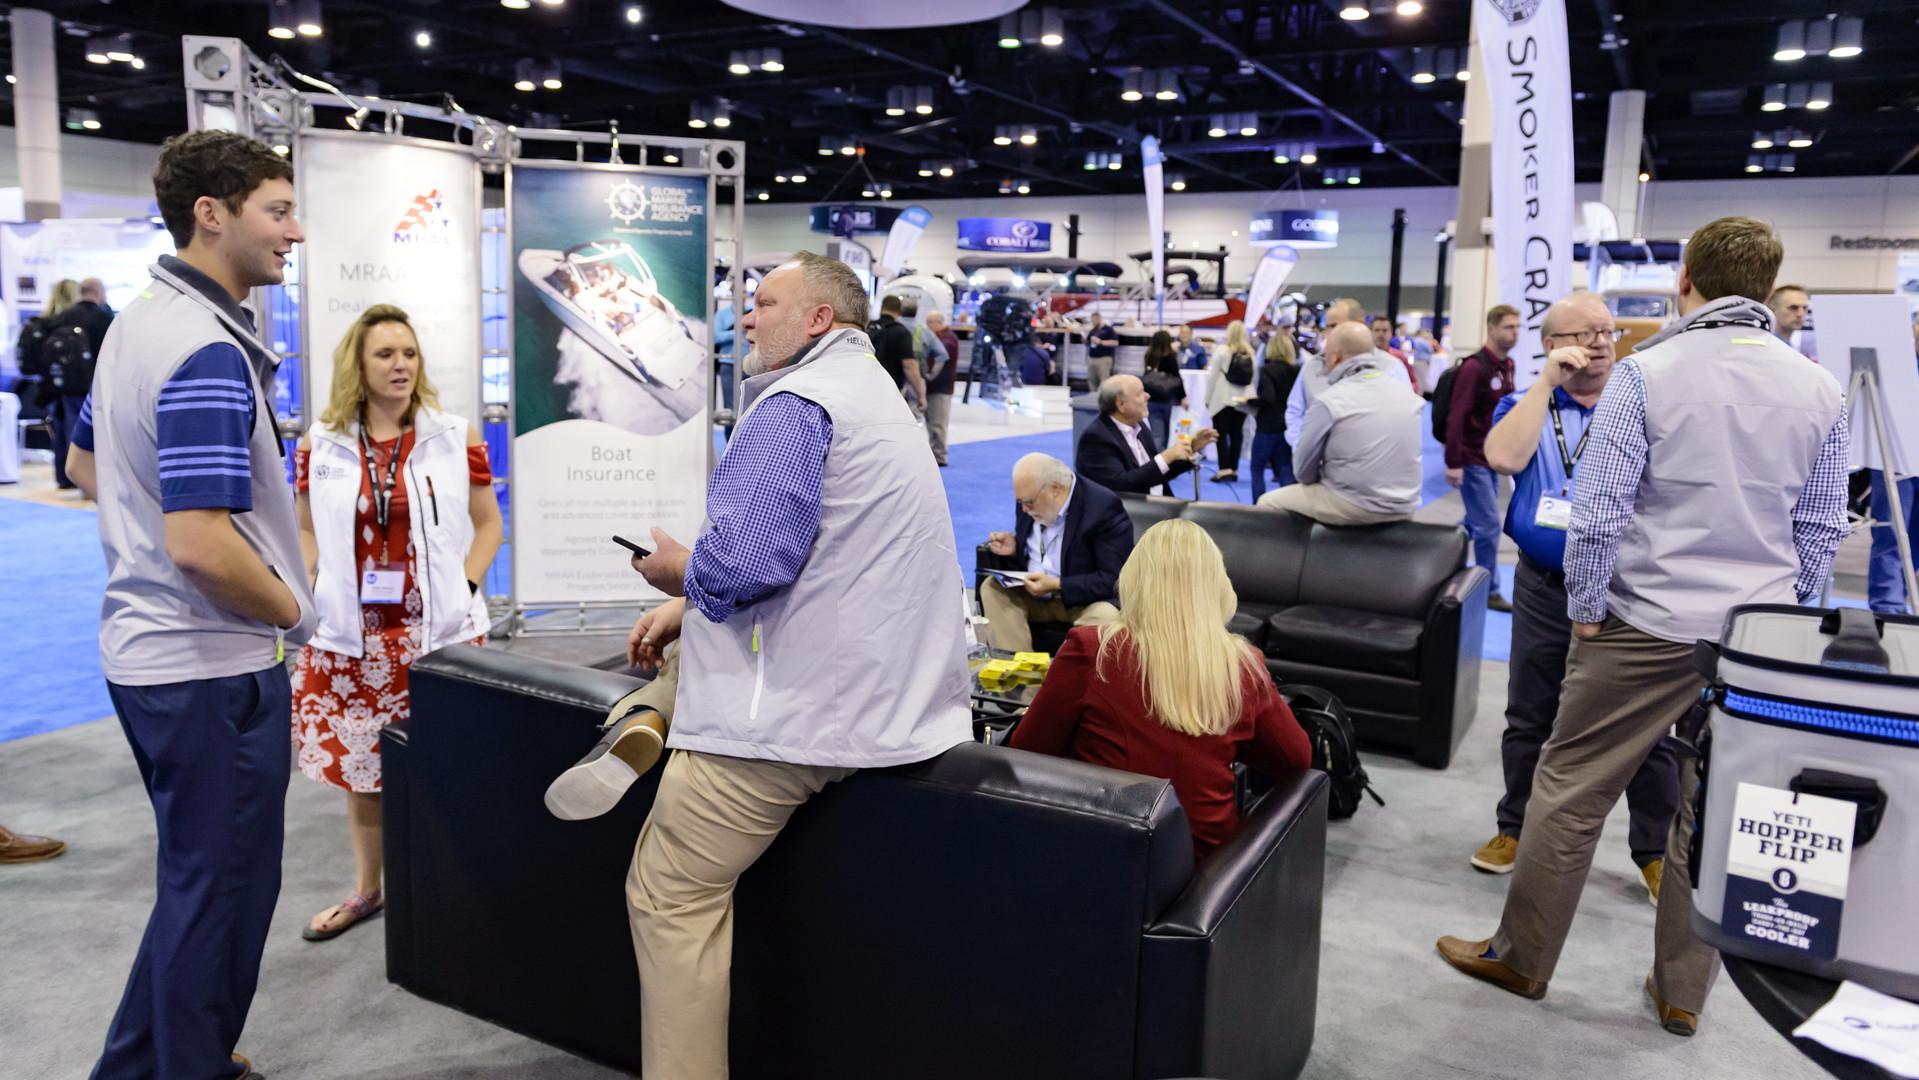 Global Marine Insurance exhibiting in 2018.